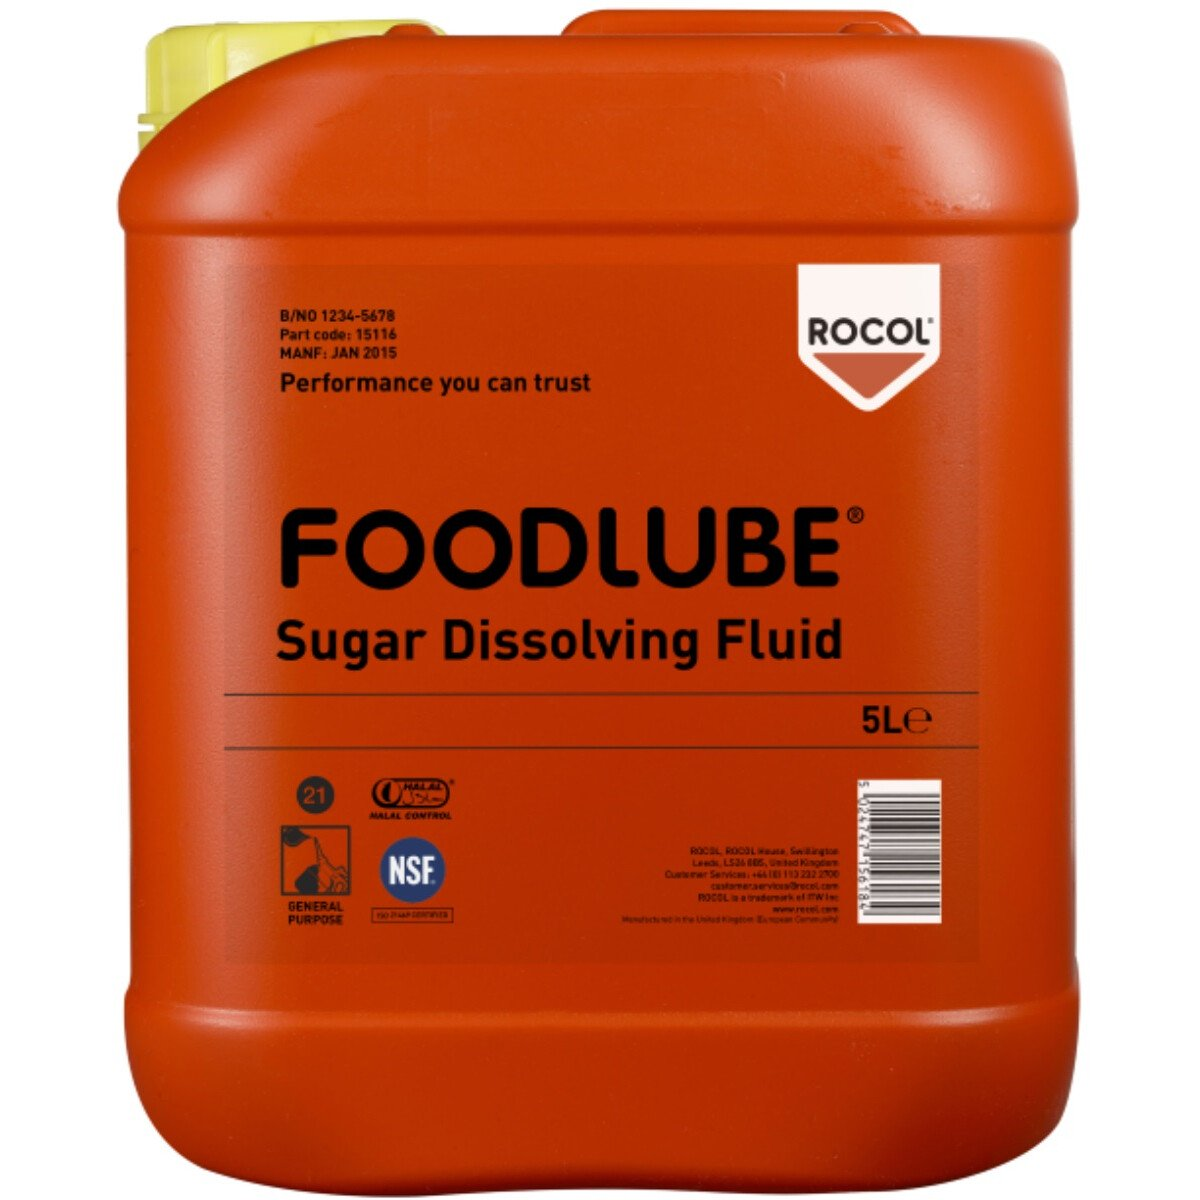 Rocol 15116 Foodlube Sugar Dissolving Fluid (NSF Registered) 5ltr